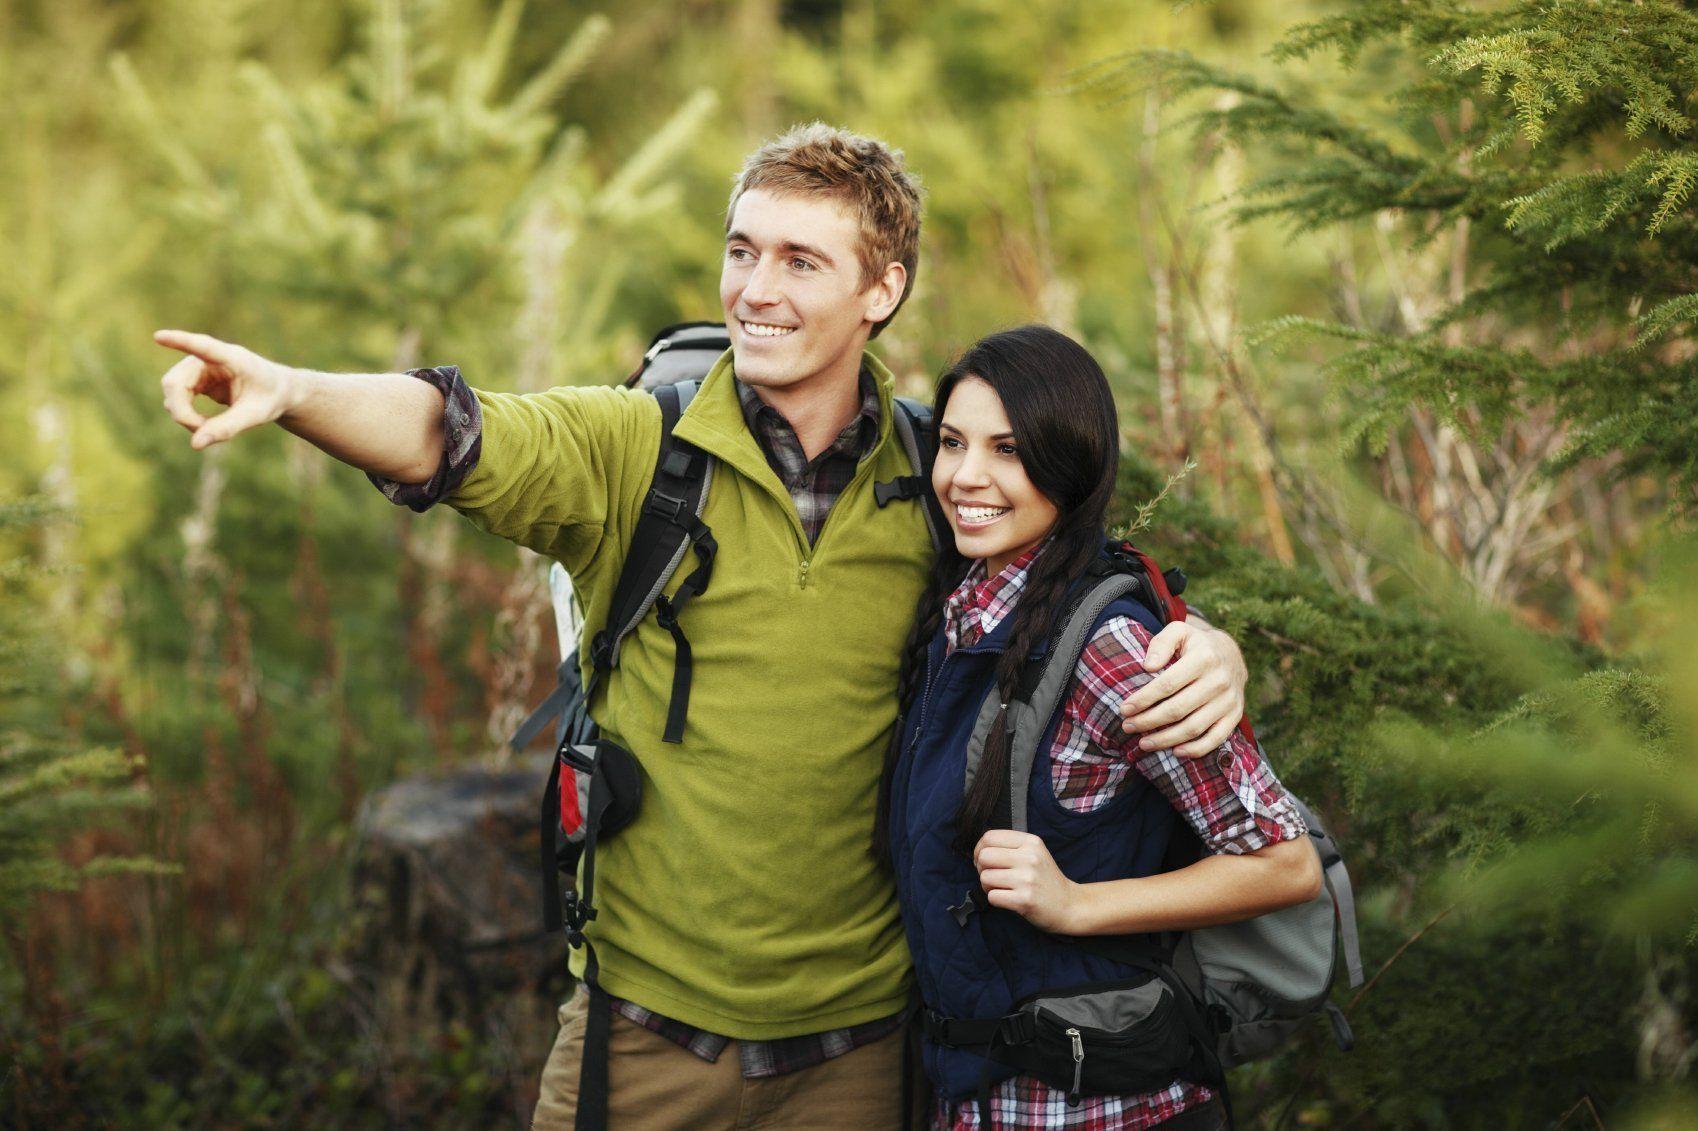 romantic-couple-first-date-ideas-hiking-adventure-couple